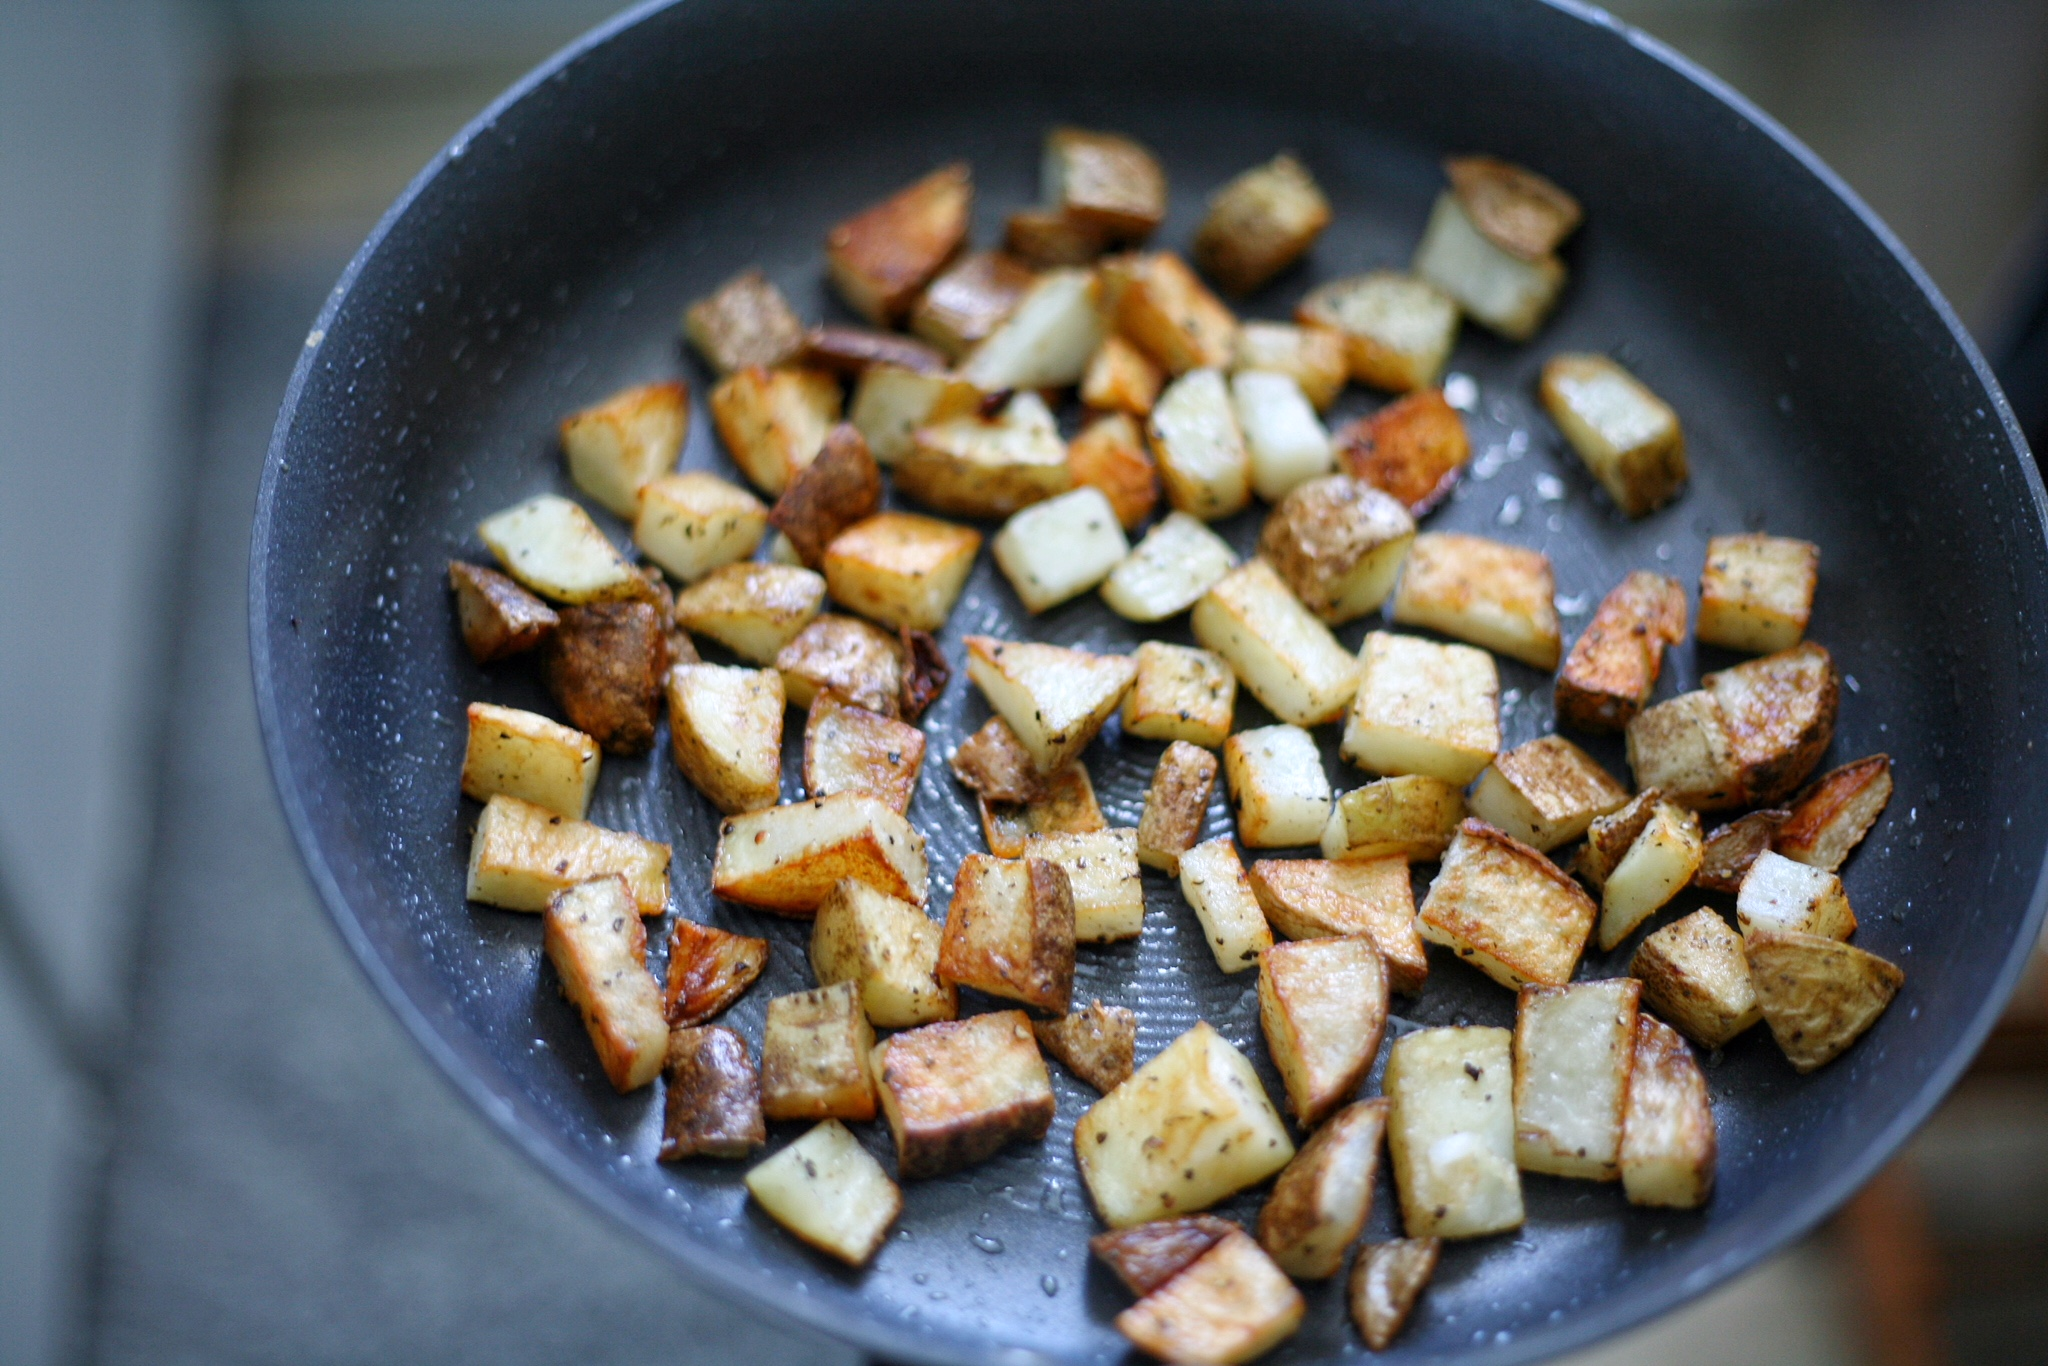 Easy_Whole30_Crispy_Breakfast_Potatoes